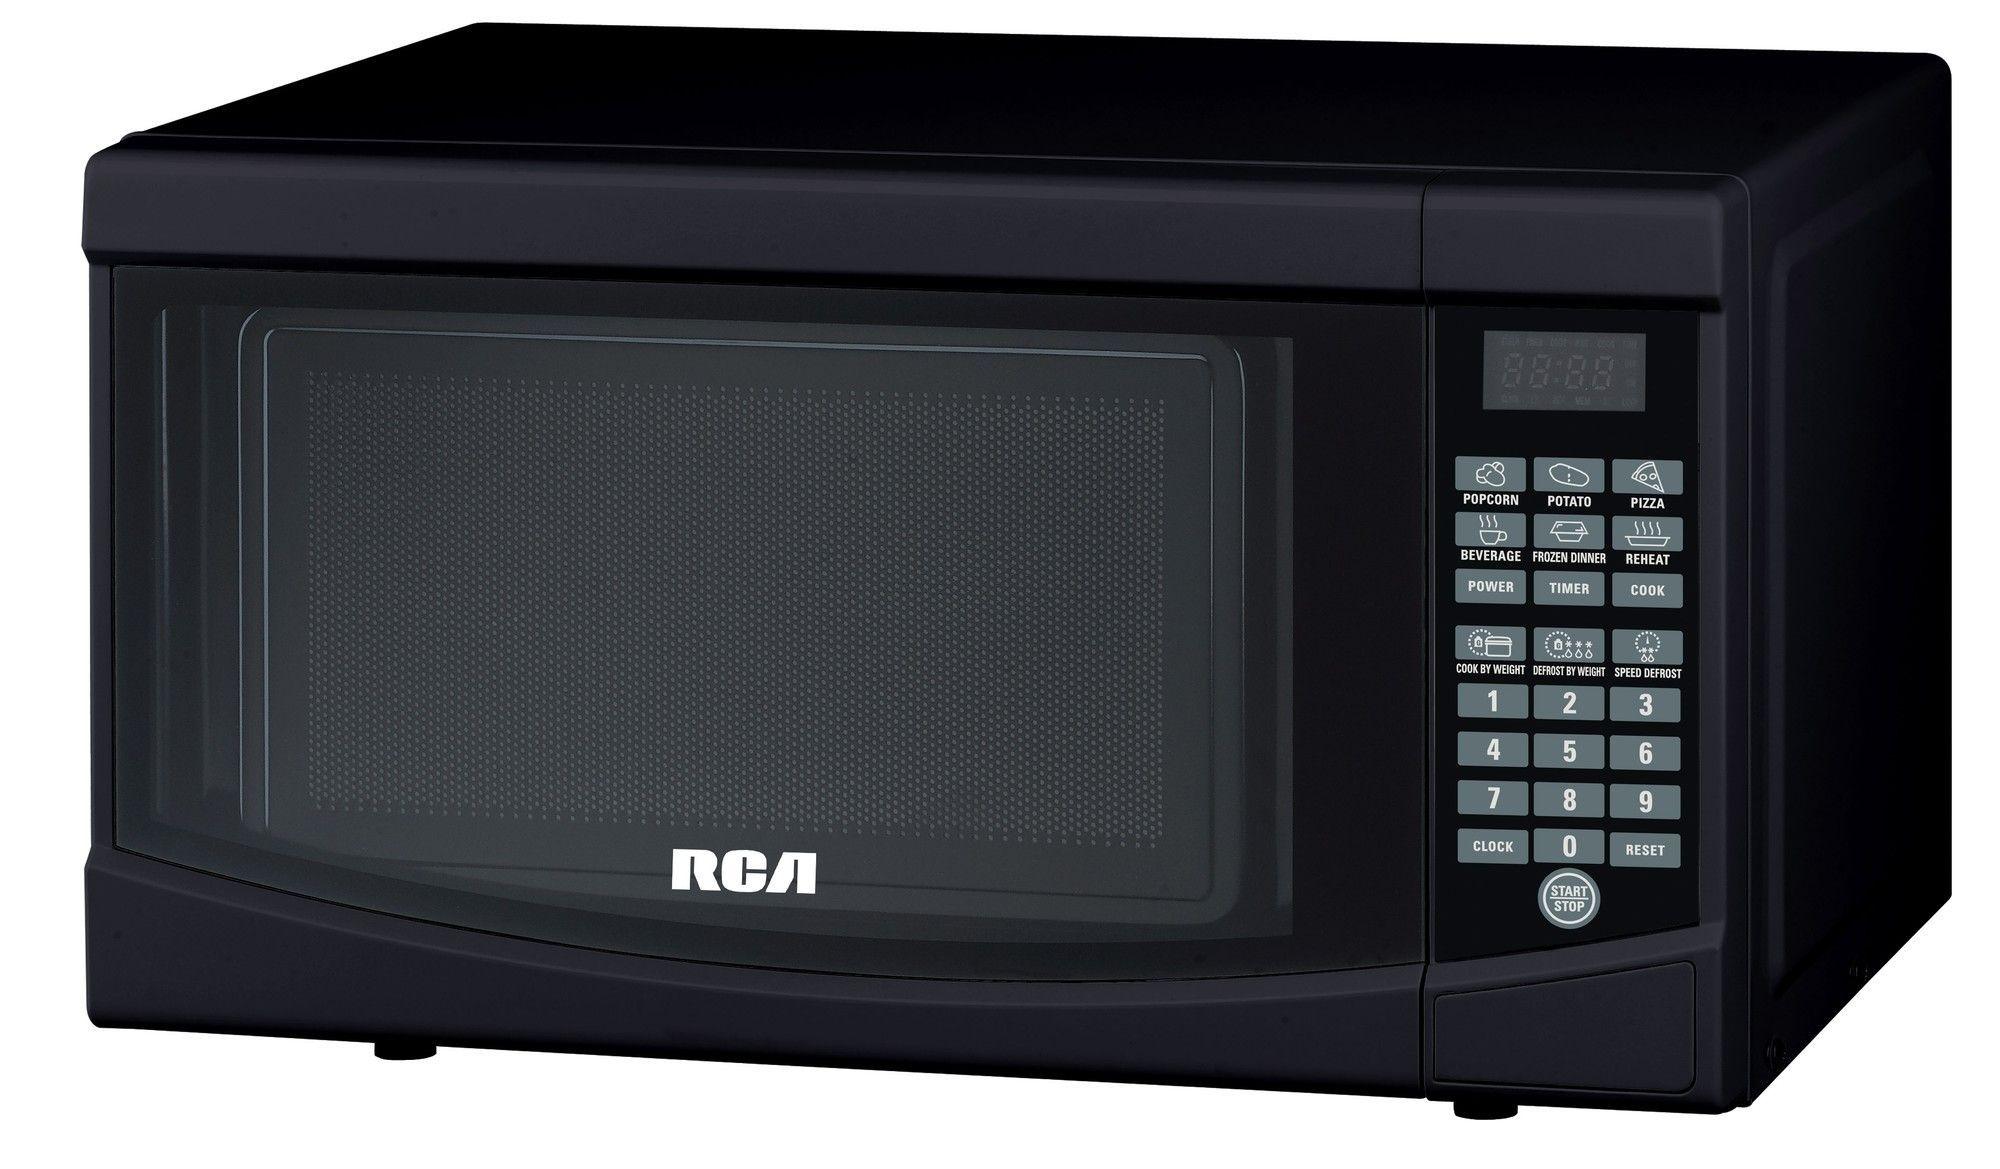 Pin On Rca Microwave